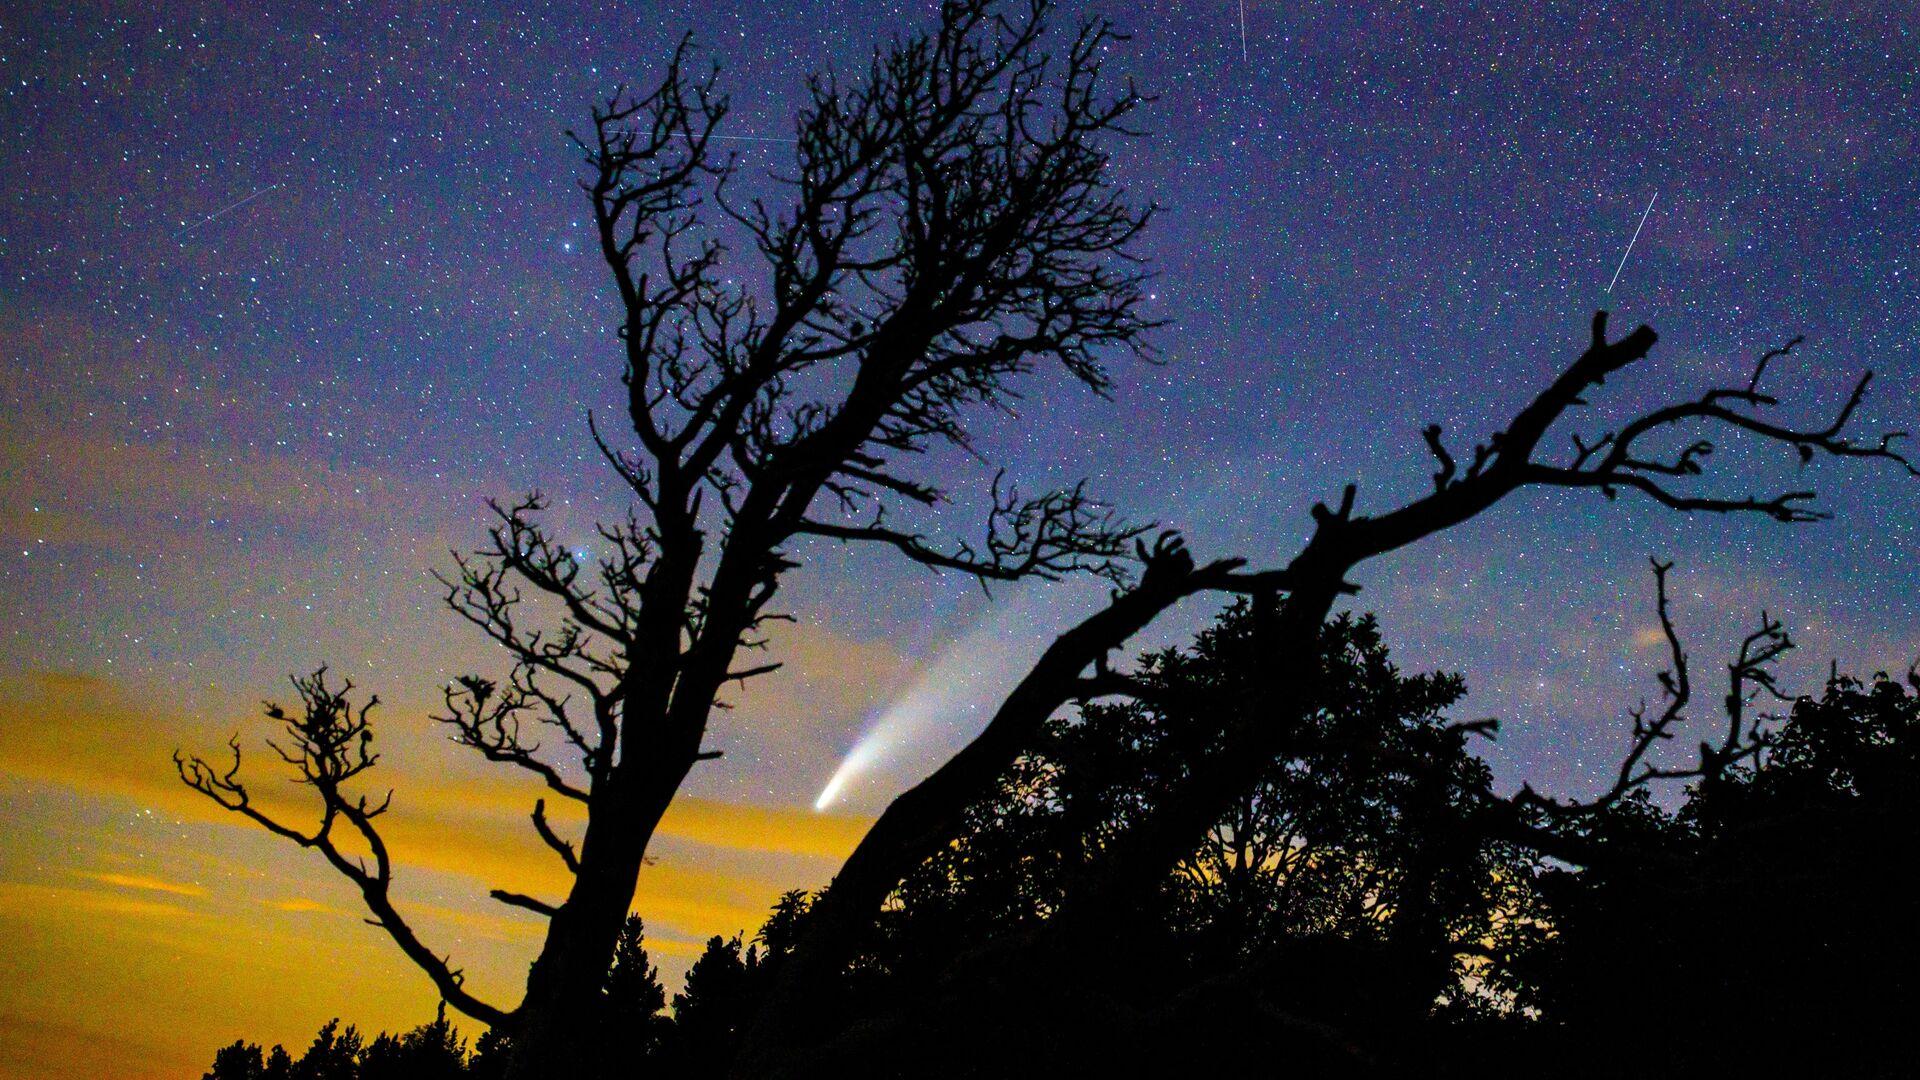 Комета NeoWise в небе над Краснодарским краем - Sputnik Узбекистан, 1920, 06.10.2021